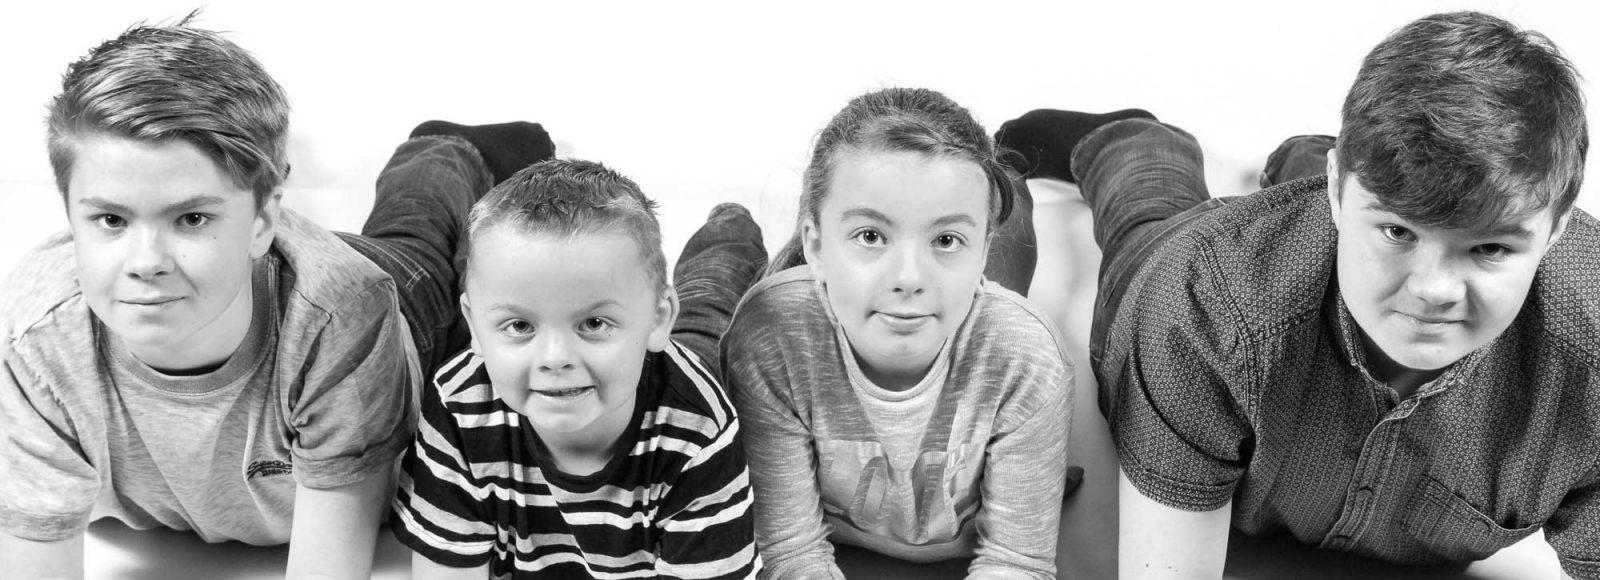 Family Photo Shoot, County Durham Block3bw